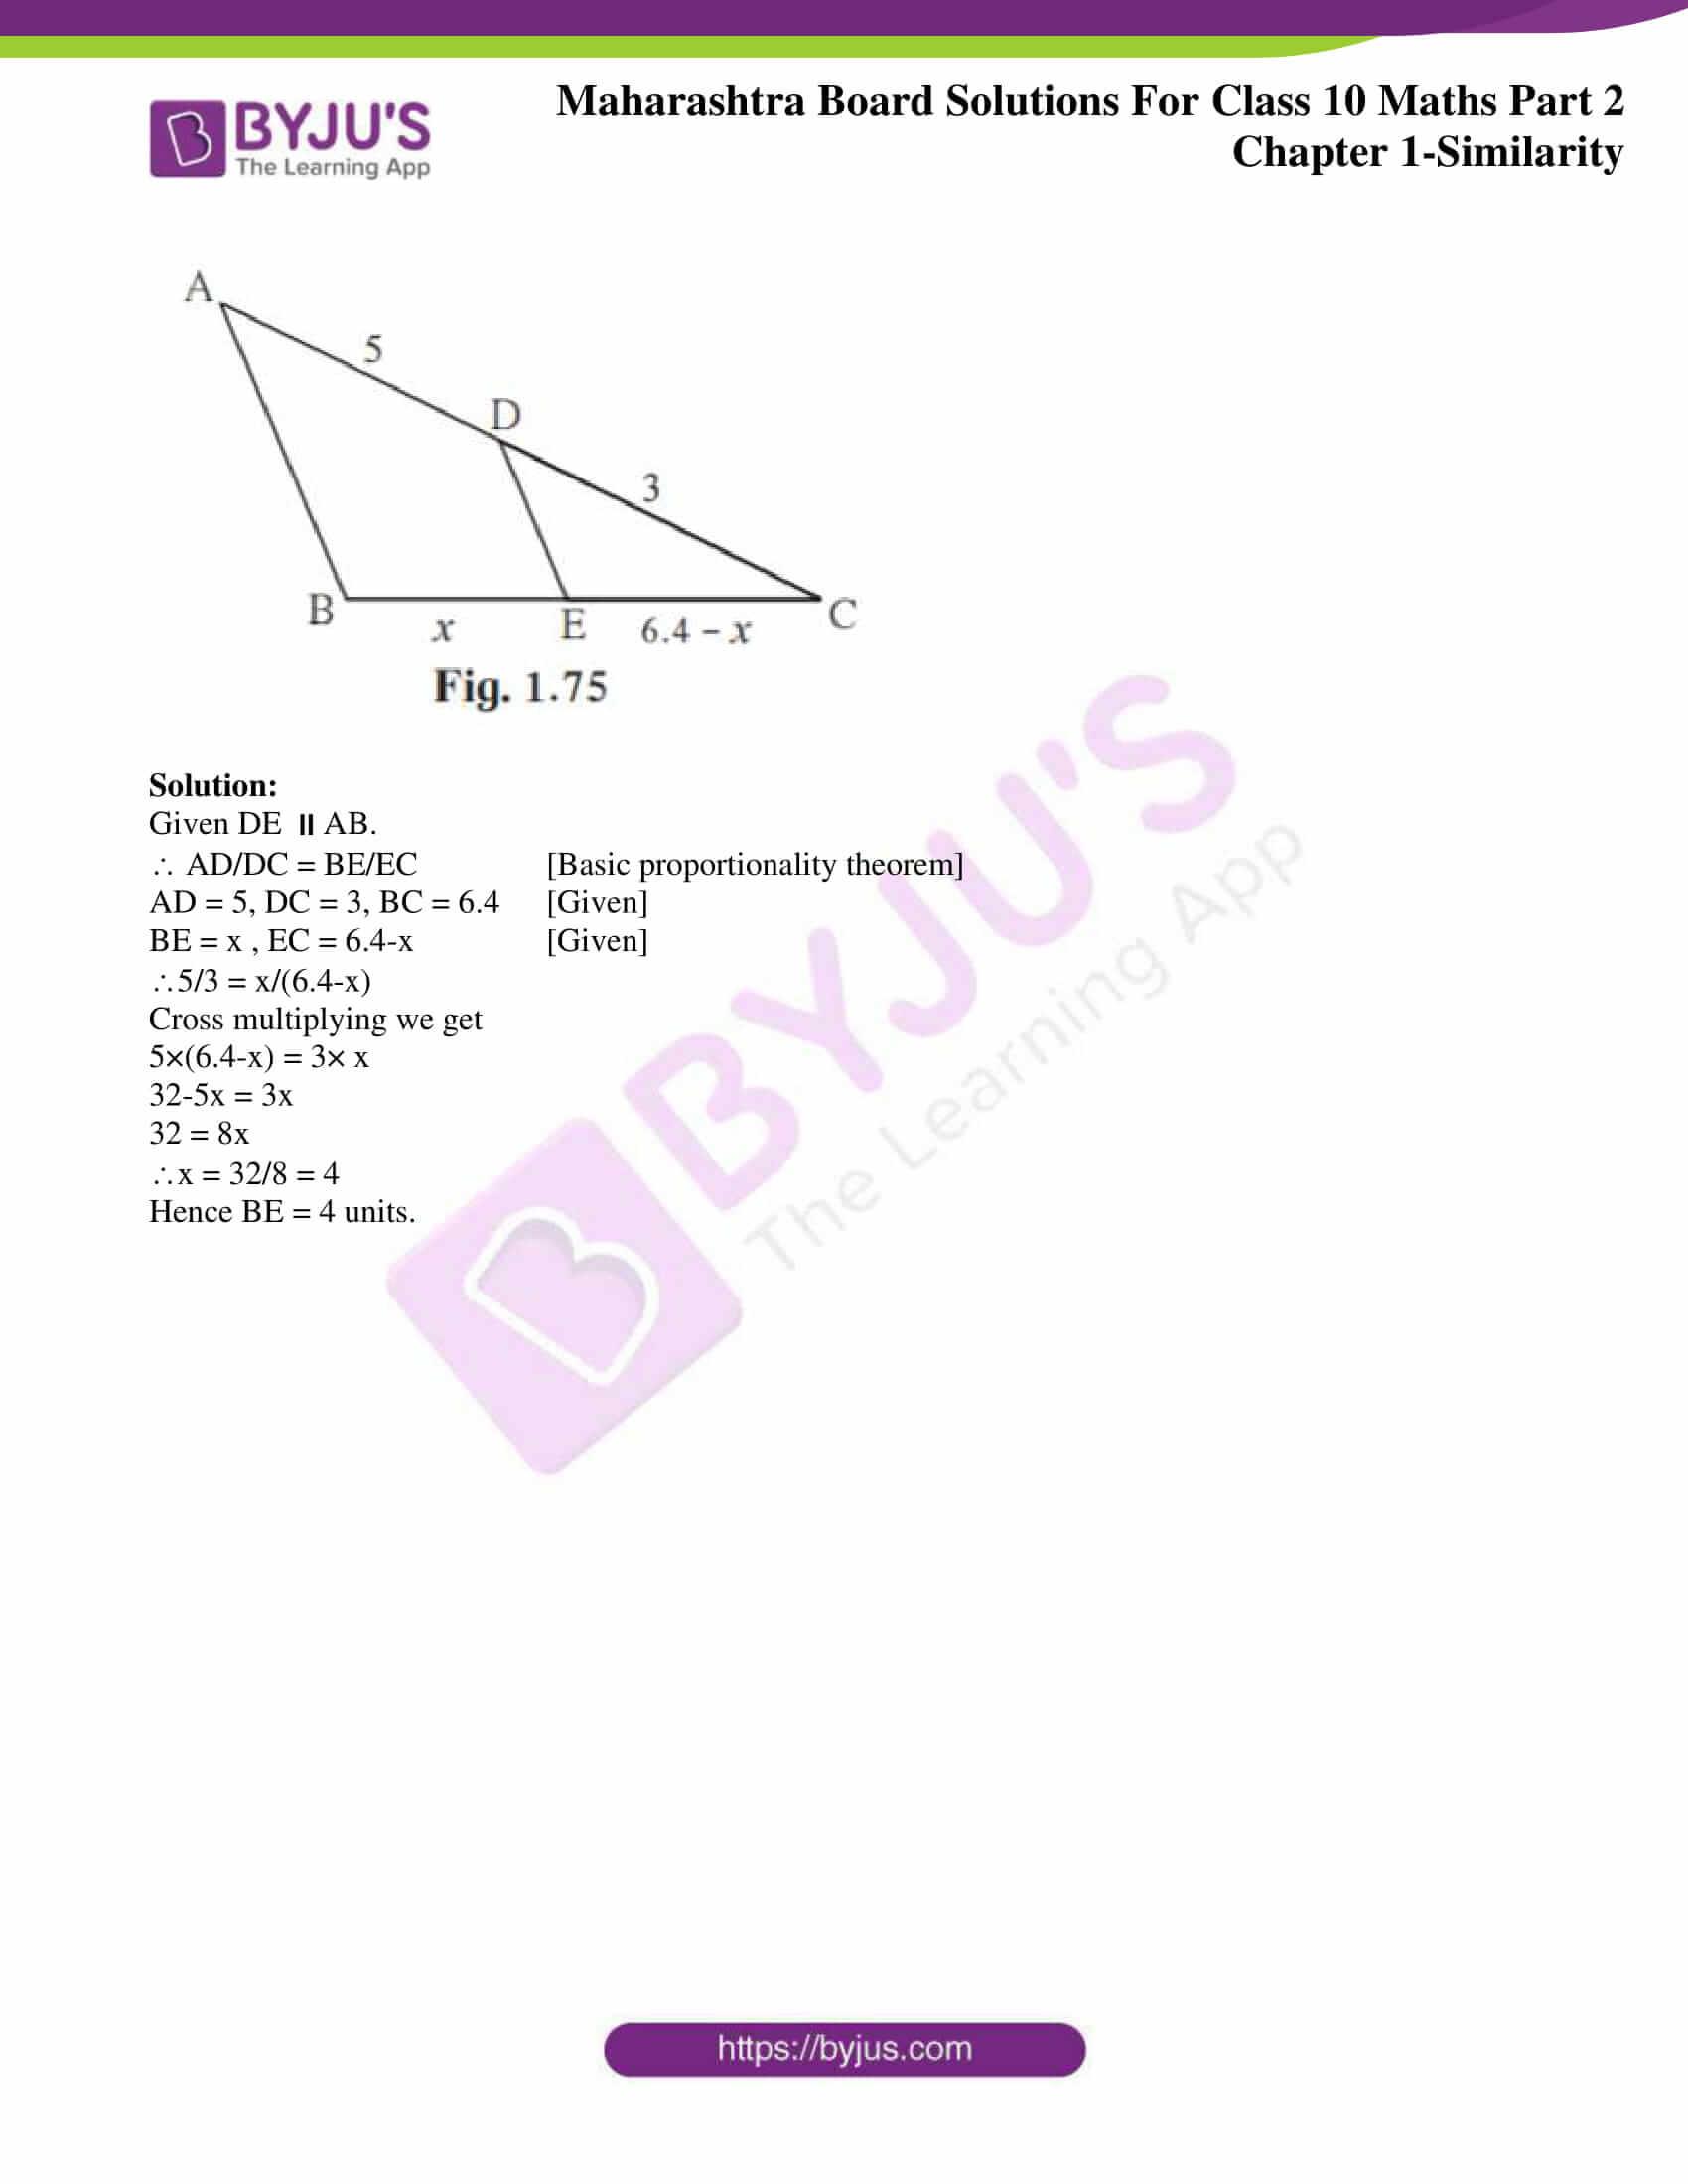 msbshse sol class 10 maths part 2 chapter 1 25